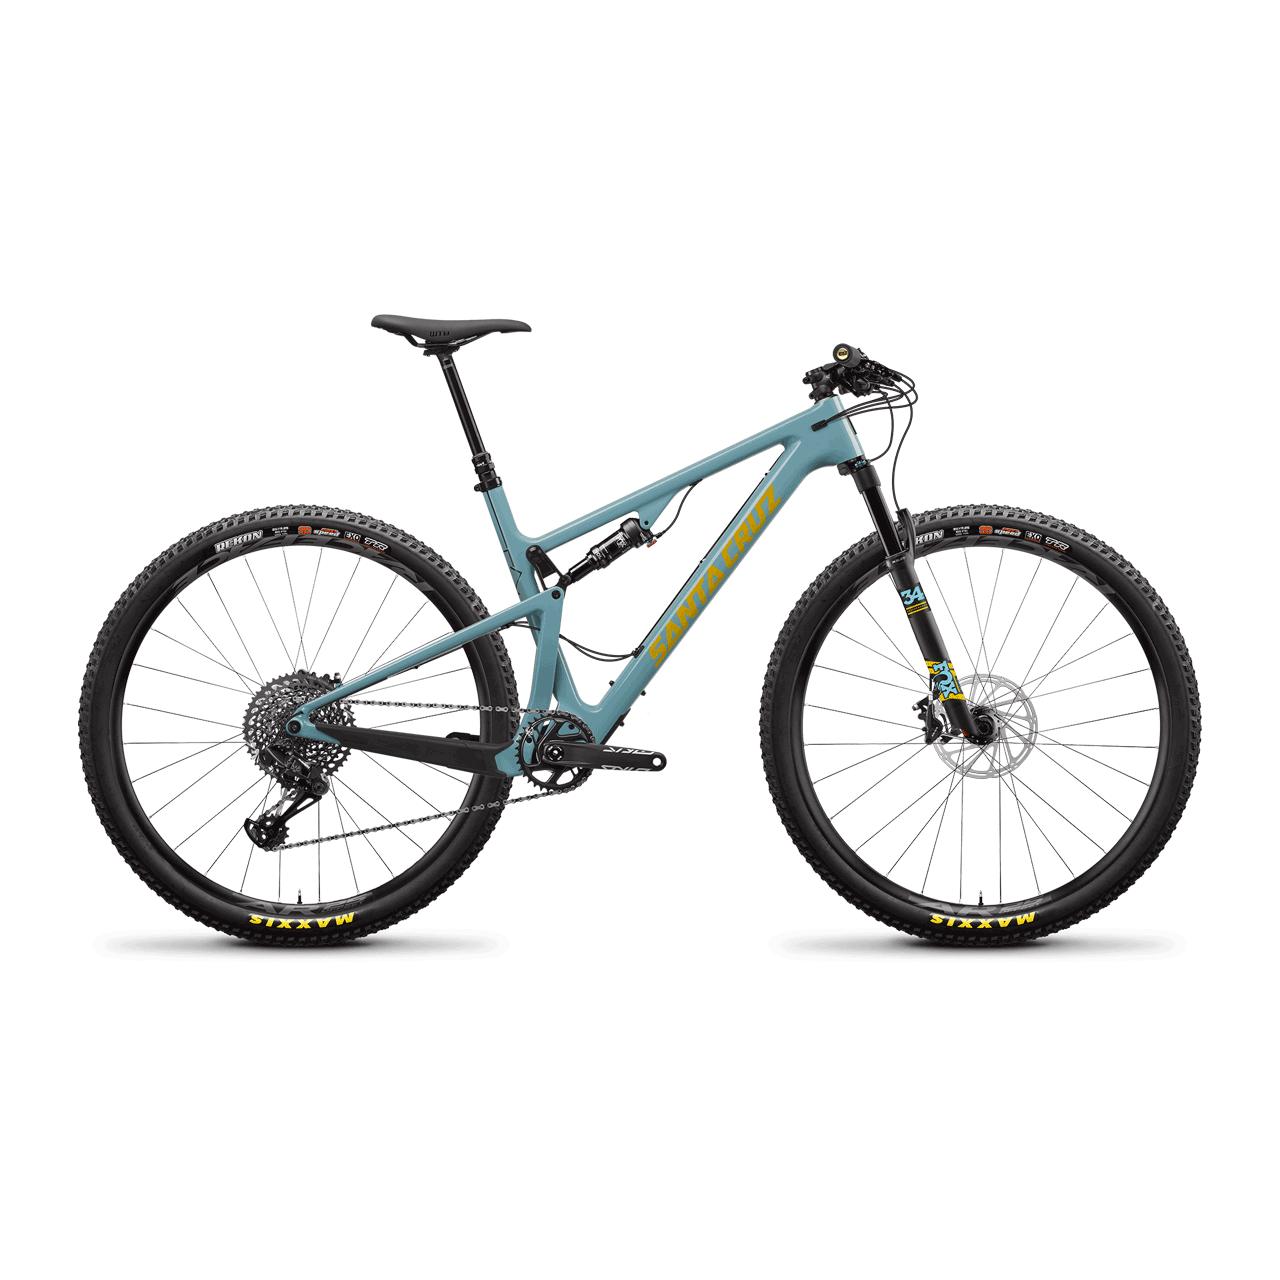 SANTA CRUZ Bici XC-MARATHON - BLUR C S TR 29 GLOSS AQUA 29 XC